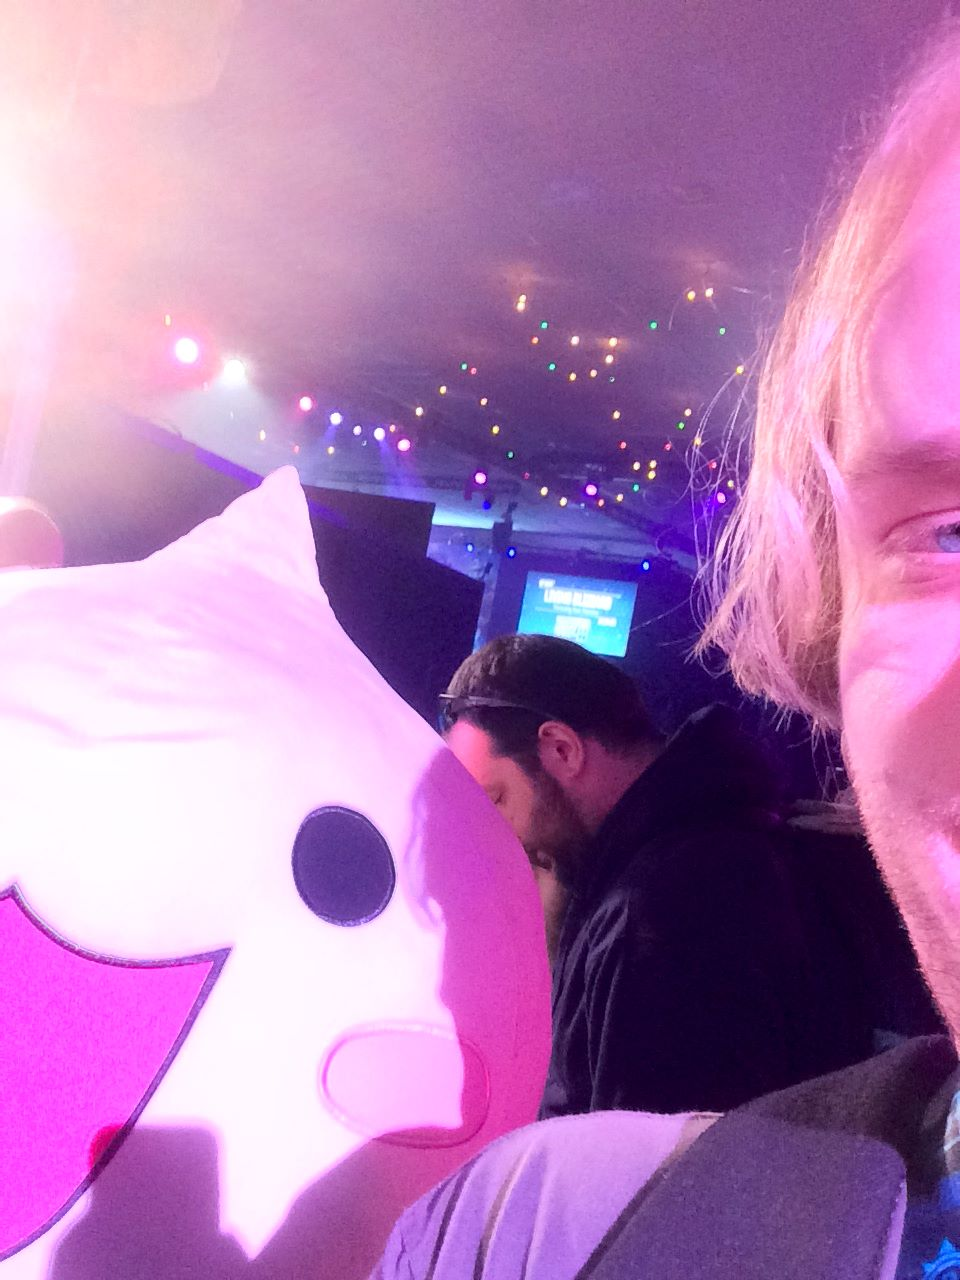 Shawn Hall & the Pachimari oversized plush at BlizzCon 2017.